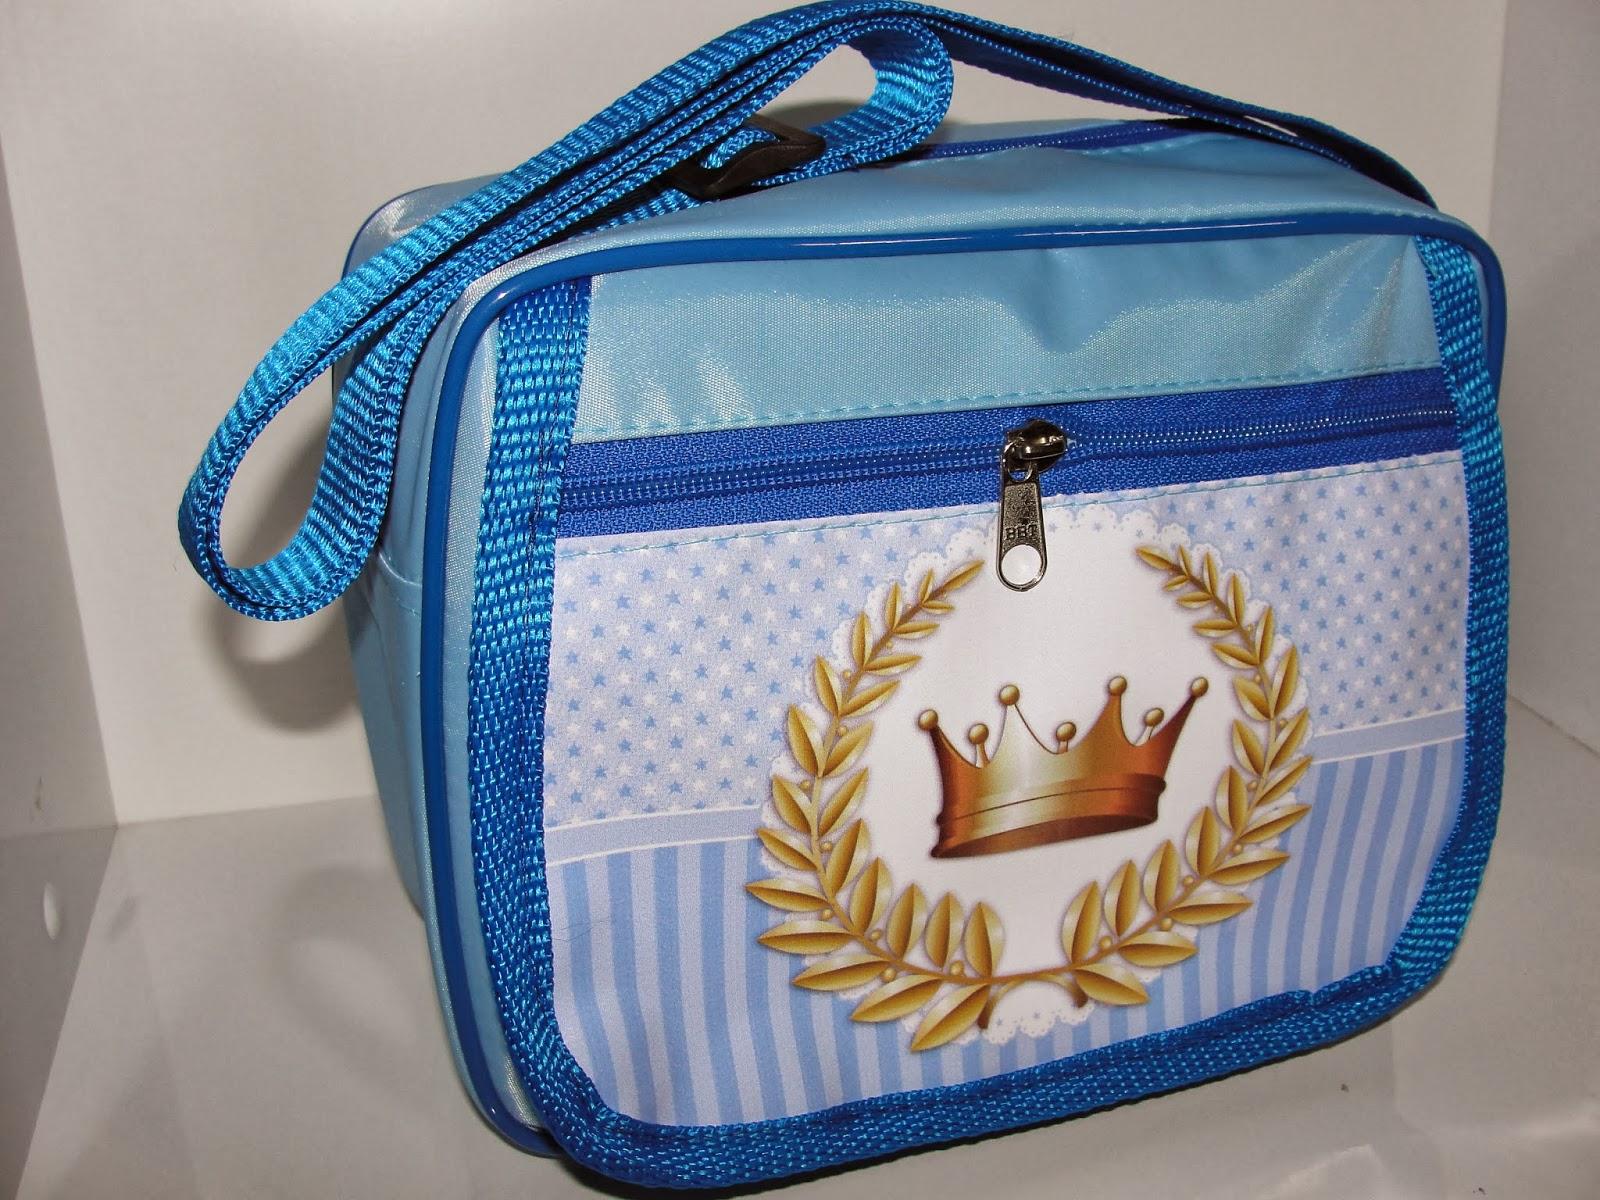 Bolsa De Festa De Aniversario : Belissima bolsas lembrancinha de aniversario pequeno principe